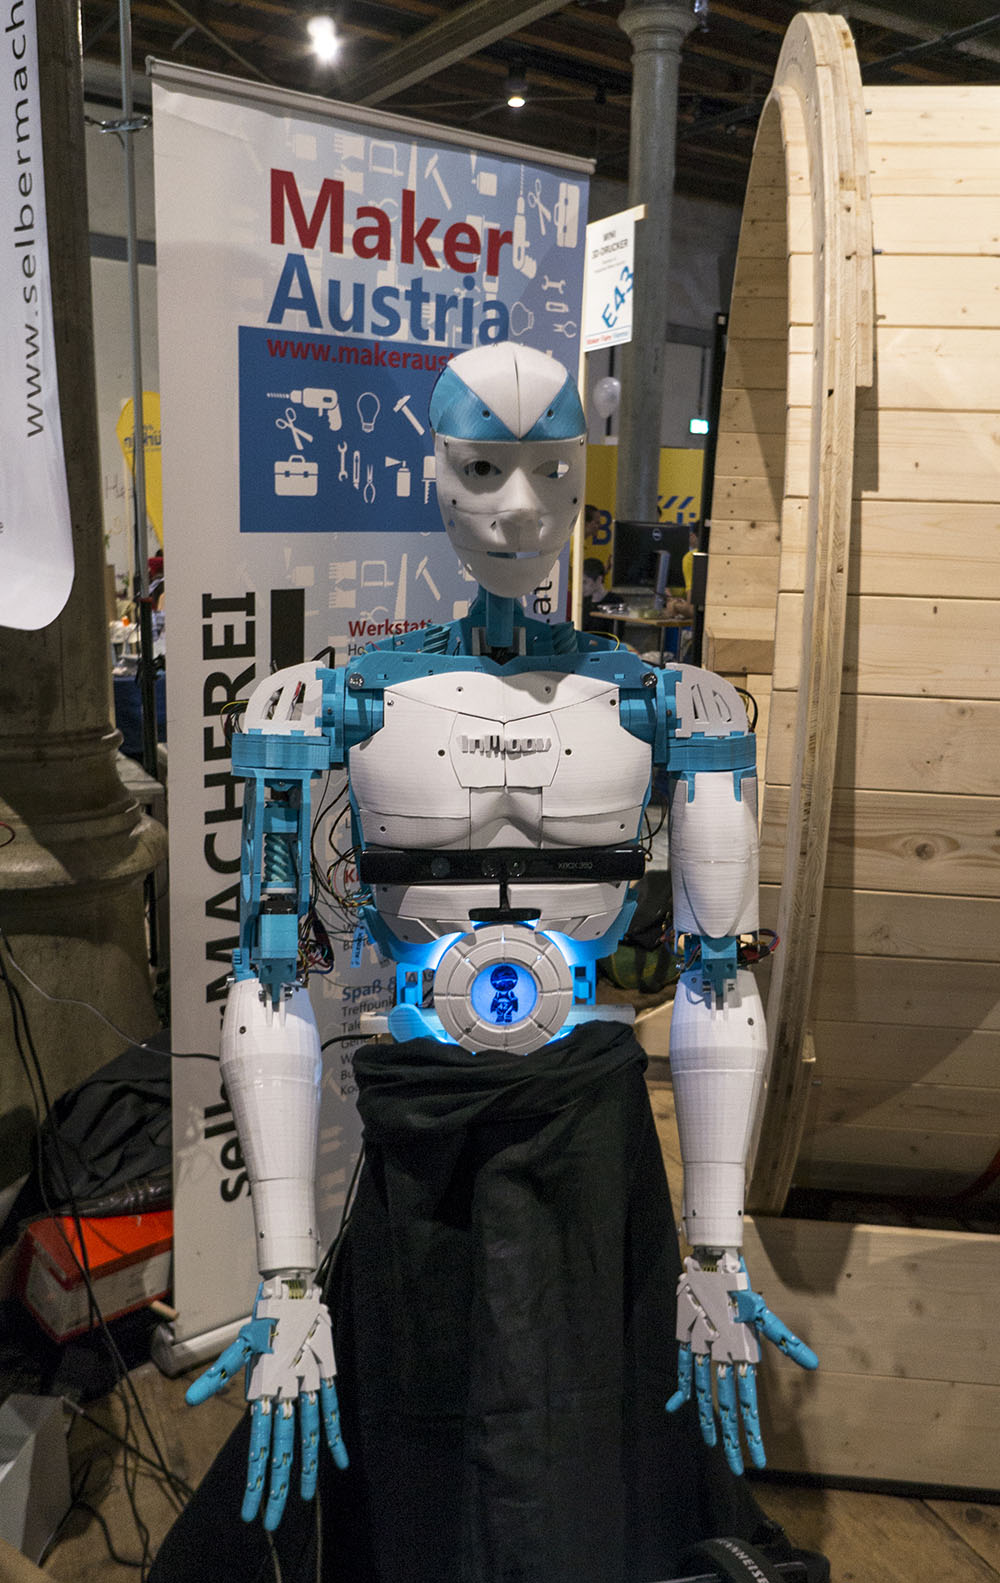 Maker_Fair_Vienna_Tvar_3D_tlac_3D_printing_07